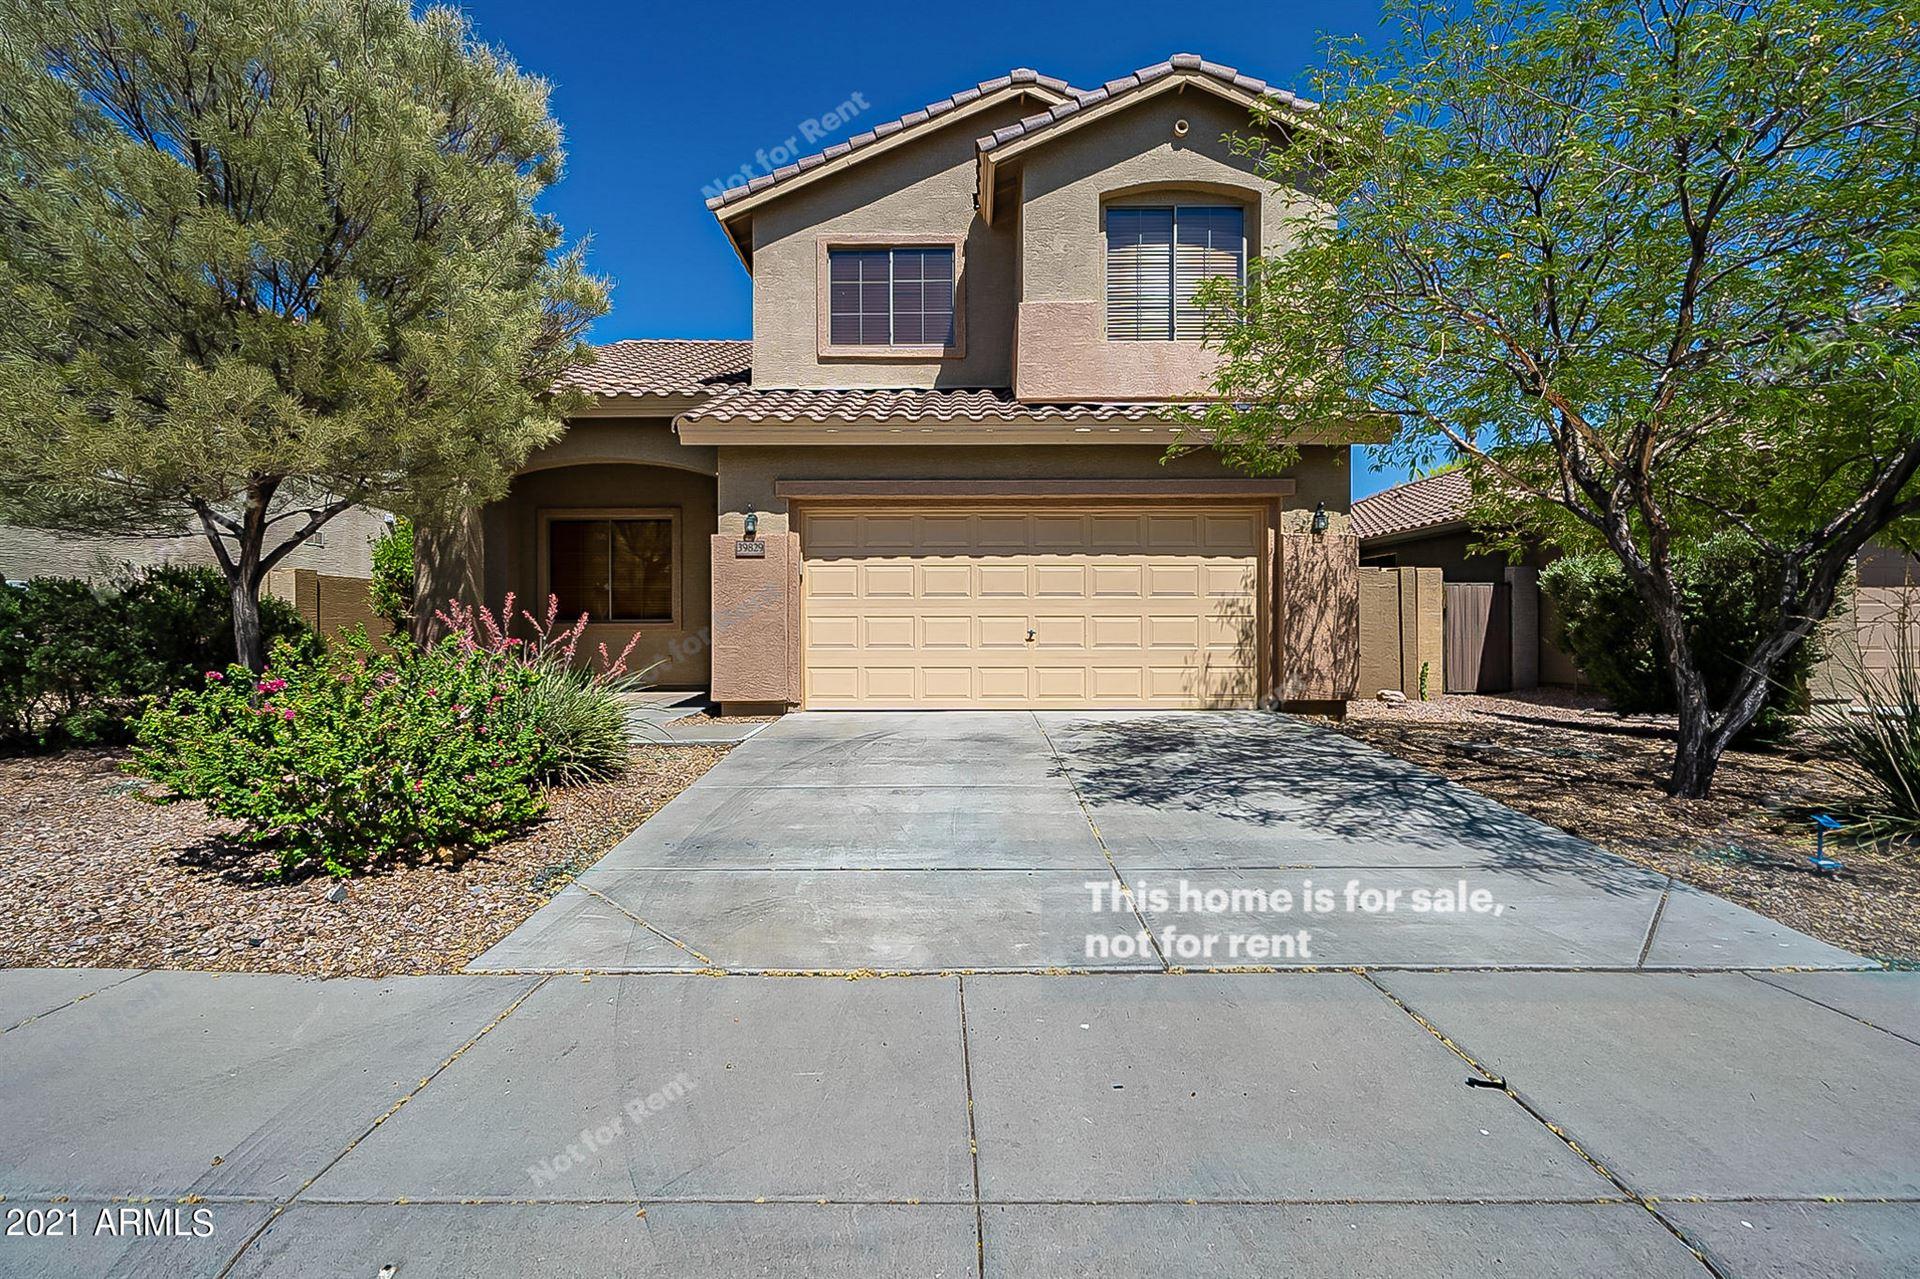 39829 N RIVER BEND Road, Phoenix, AZ 85086 - MLS#: 6235891